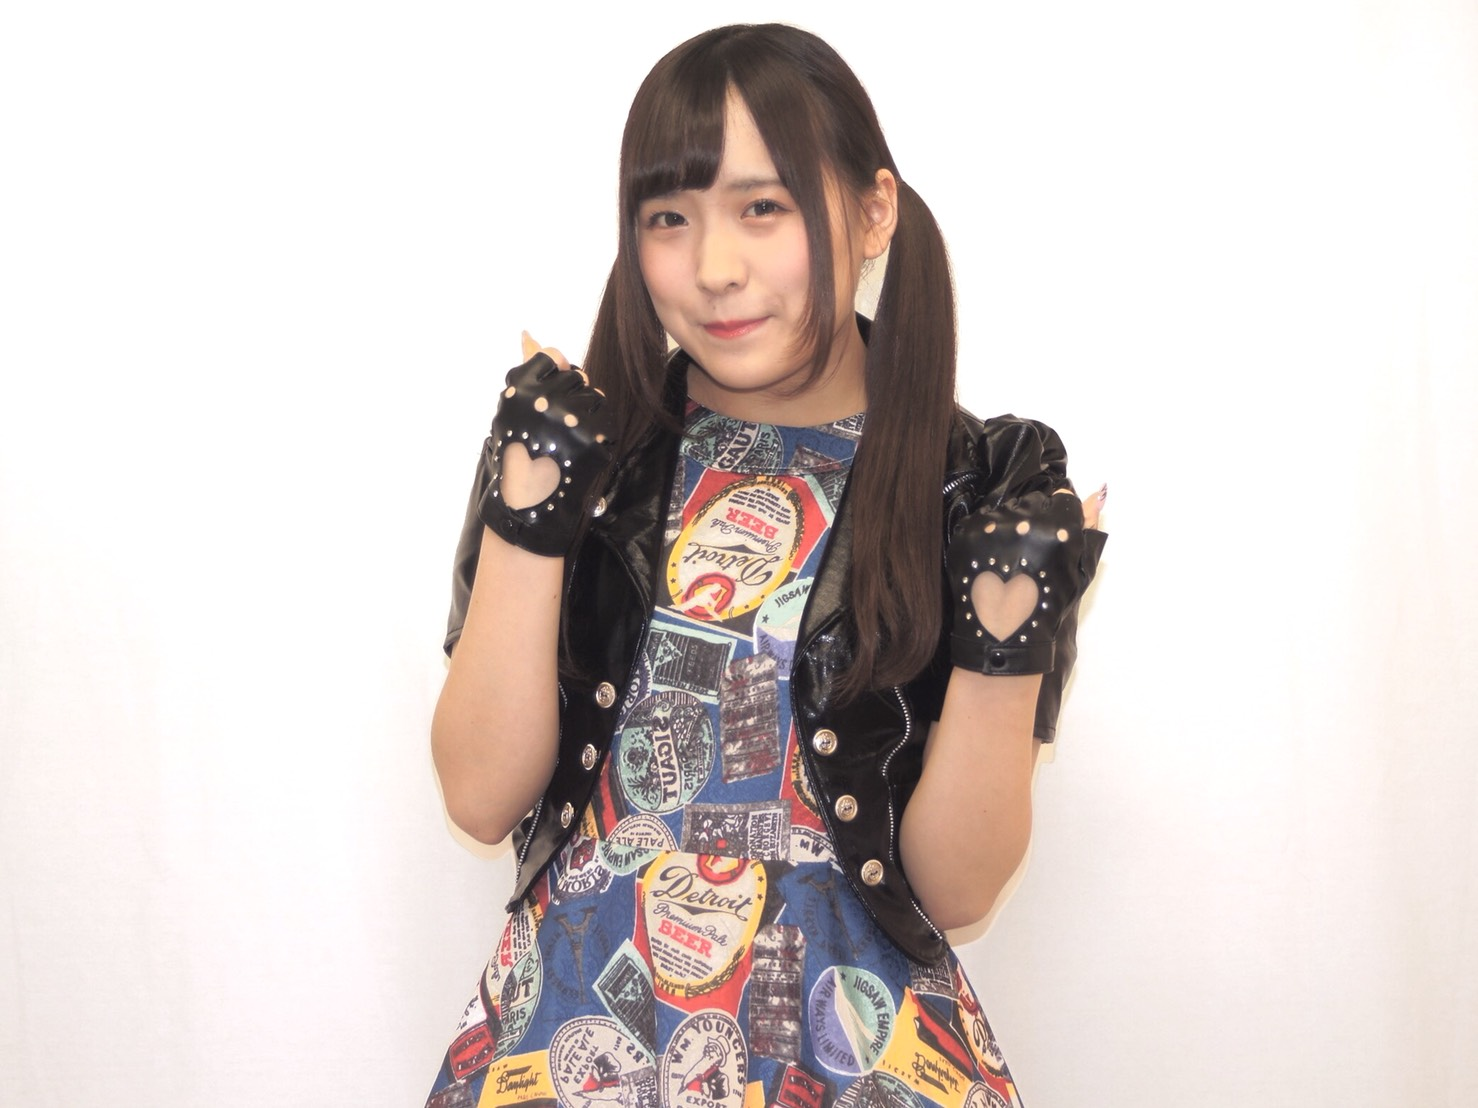 CLUB アイパラ(アイドルDJイベント)